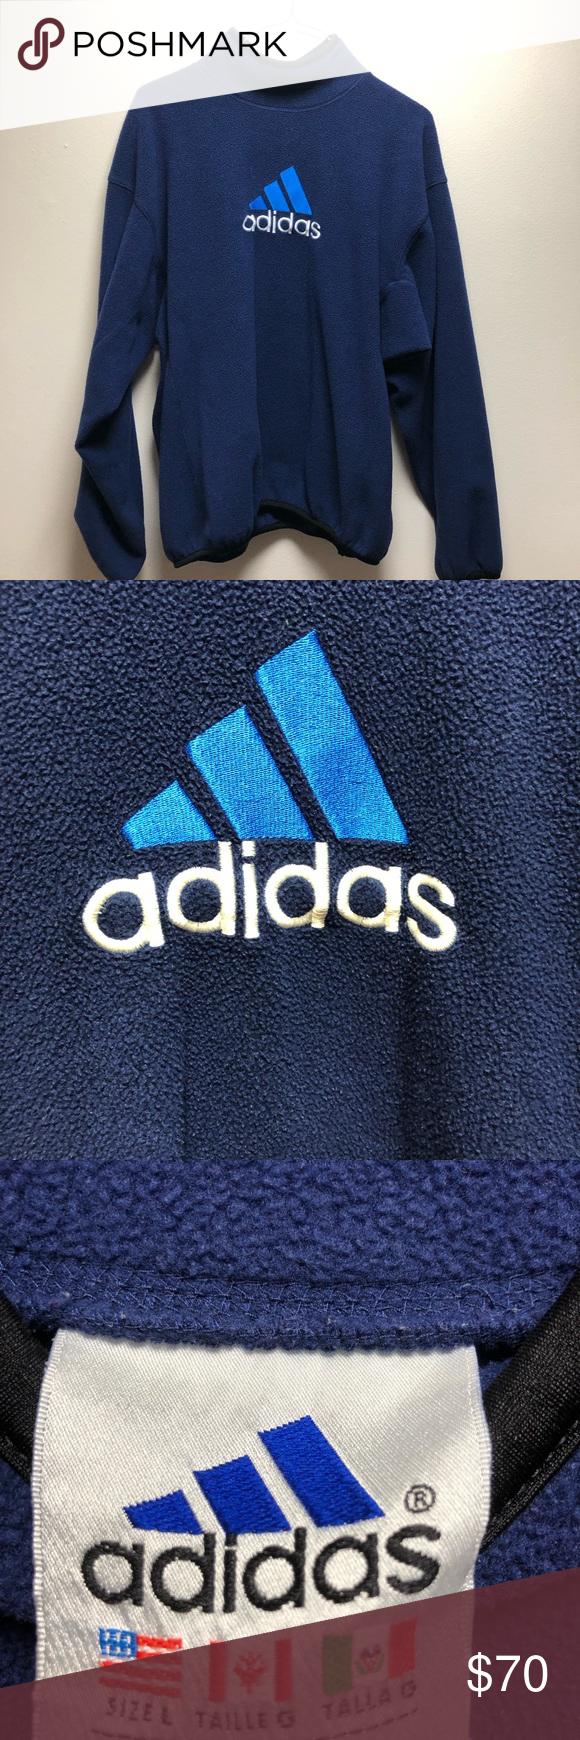 Download Vintage Large Adidas Mock Neck Fleece | Adidas sweater ...